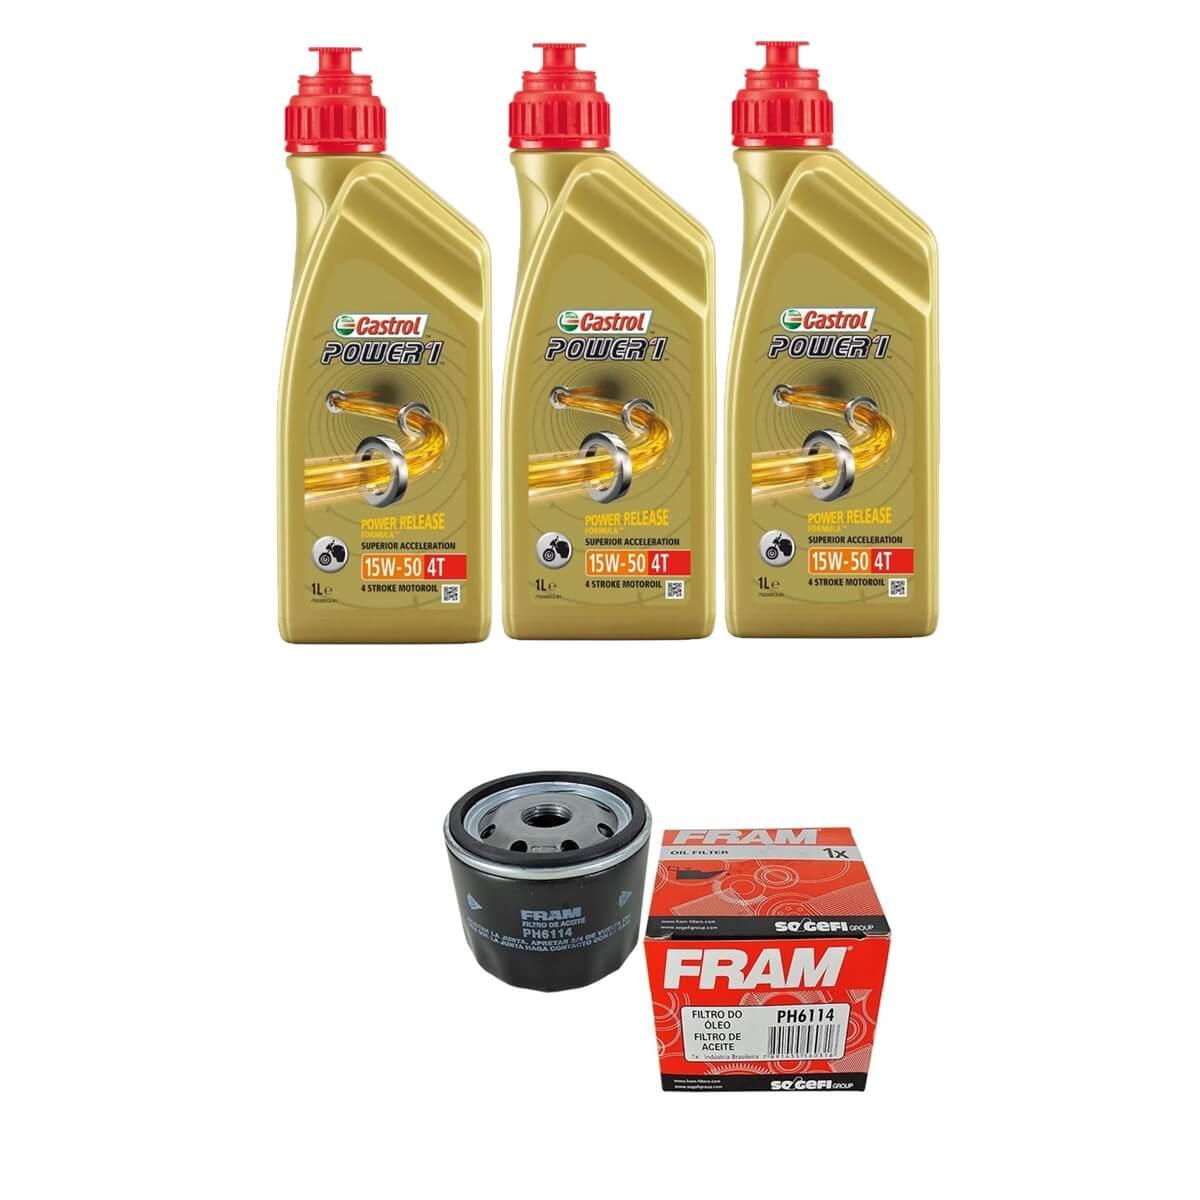 Kit Troca de Oleo Castrol Power 1 15w50 3lt + Filtro Fram PH6114